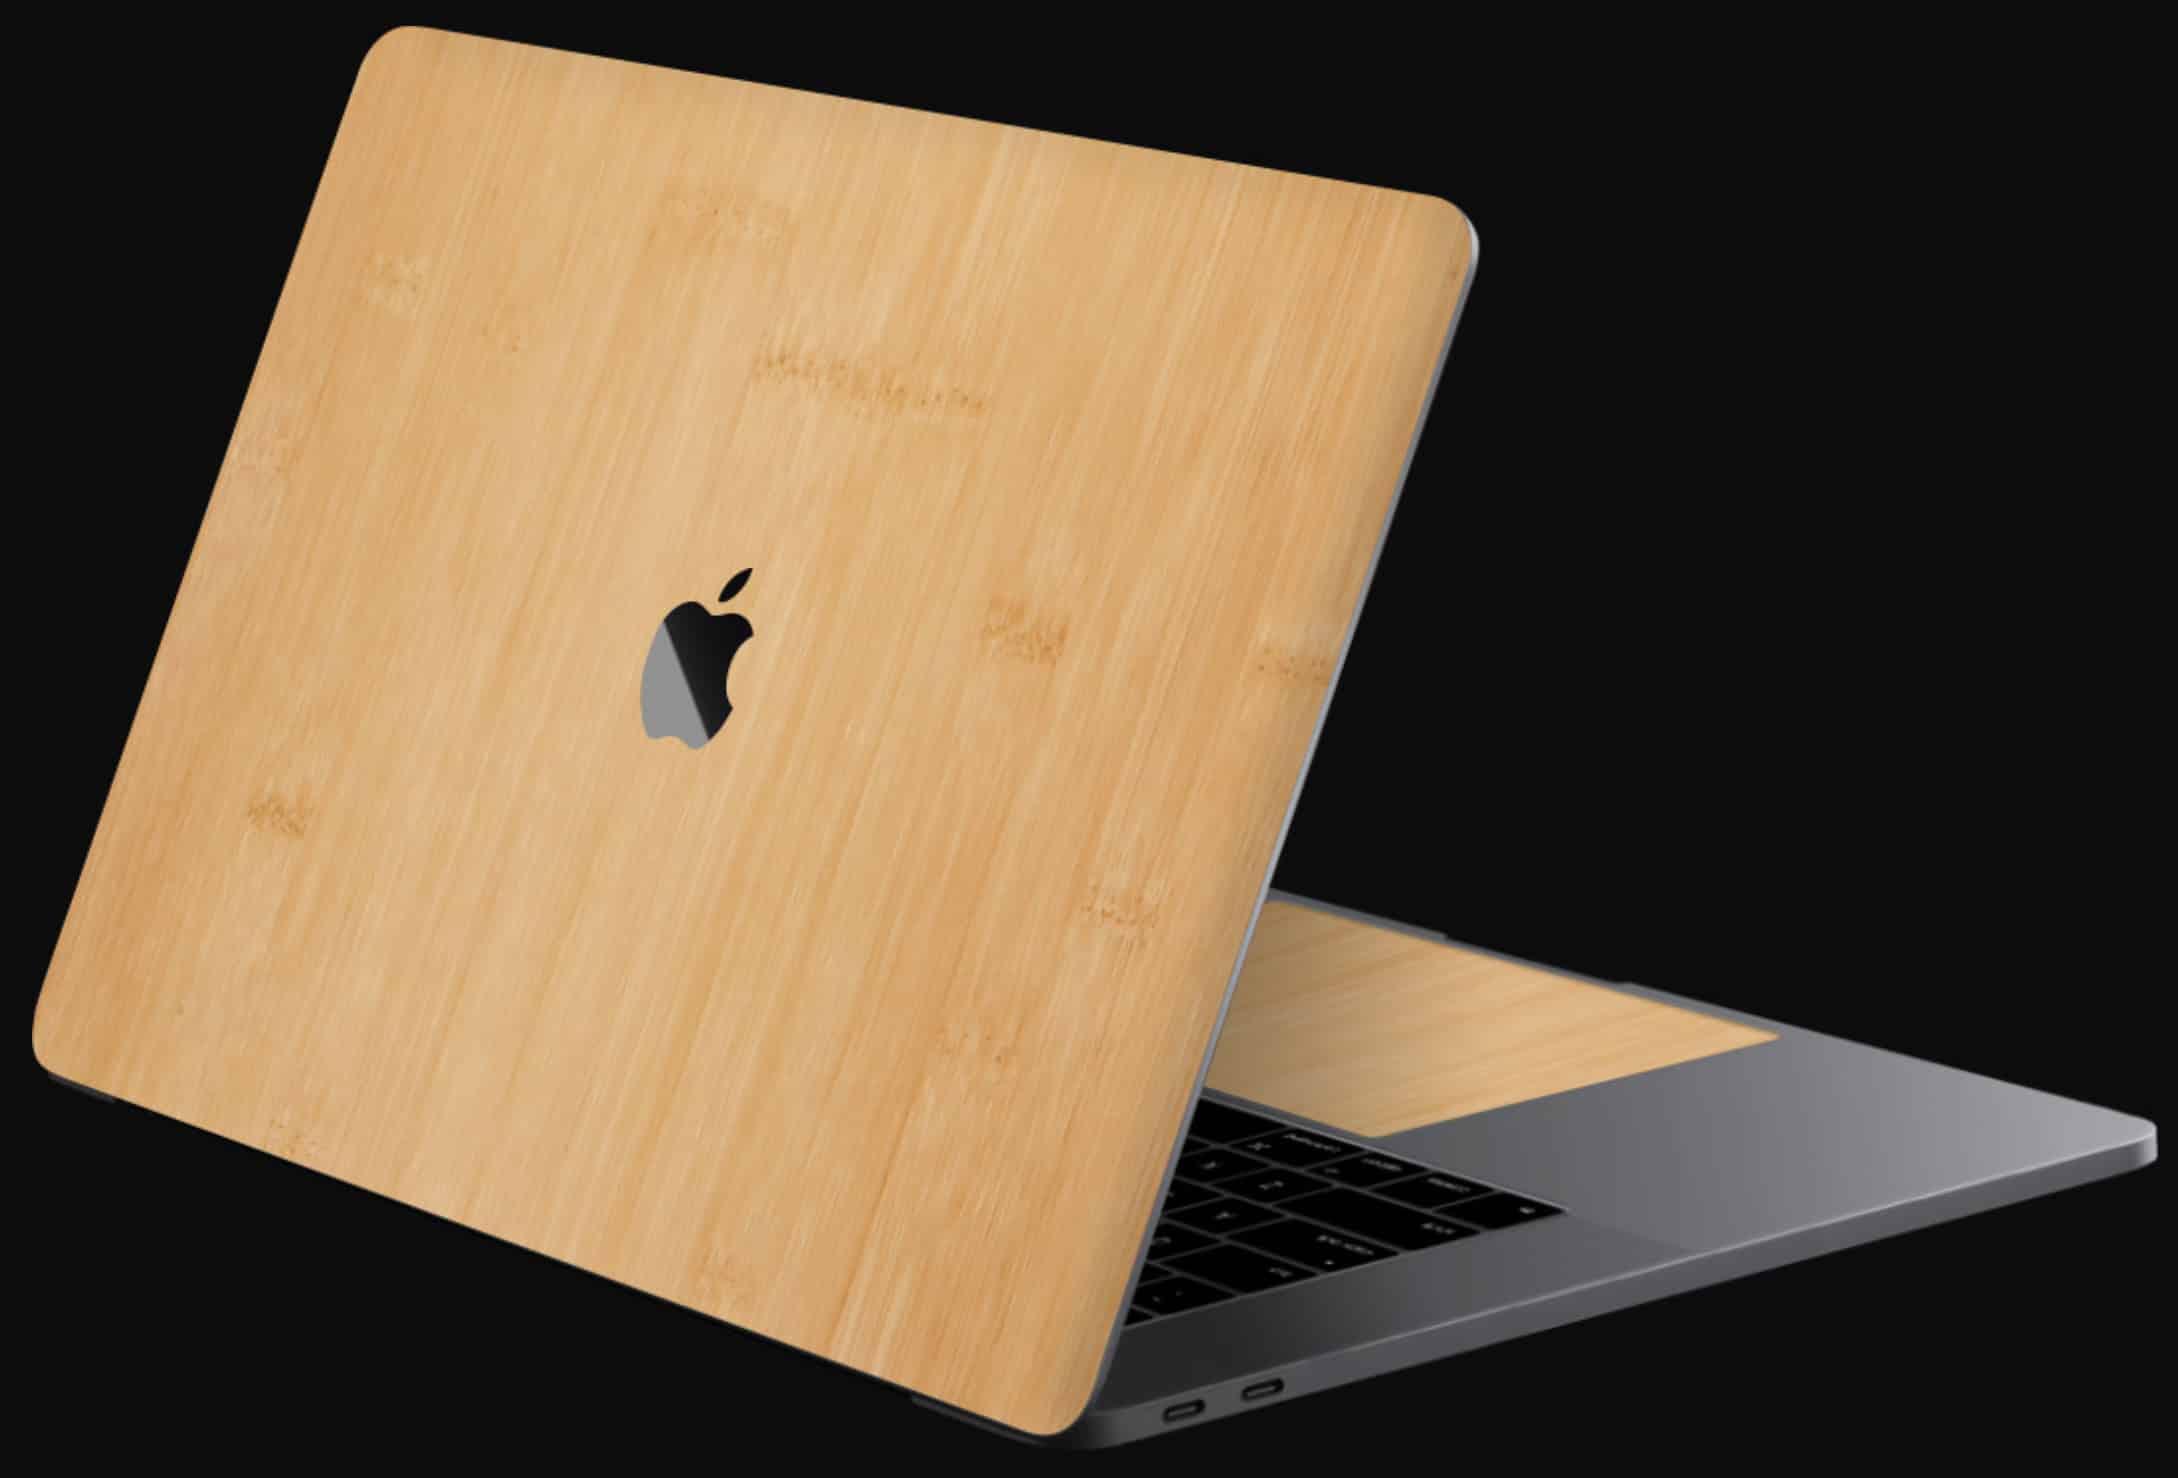 dbrand macbook pro skin